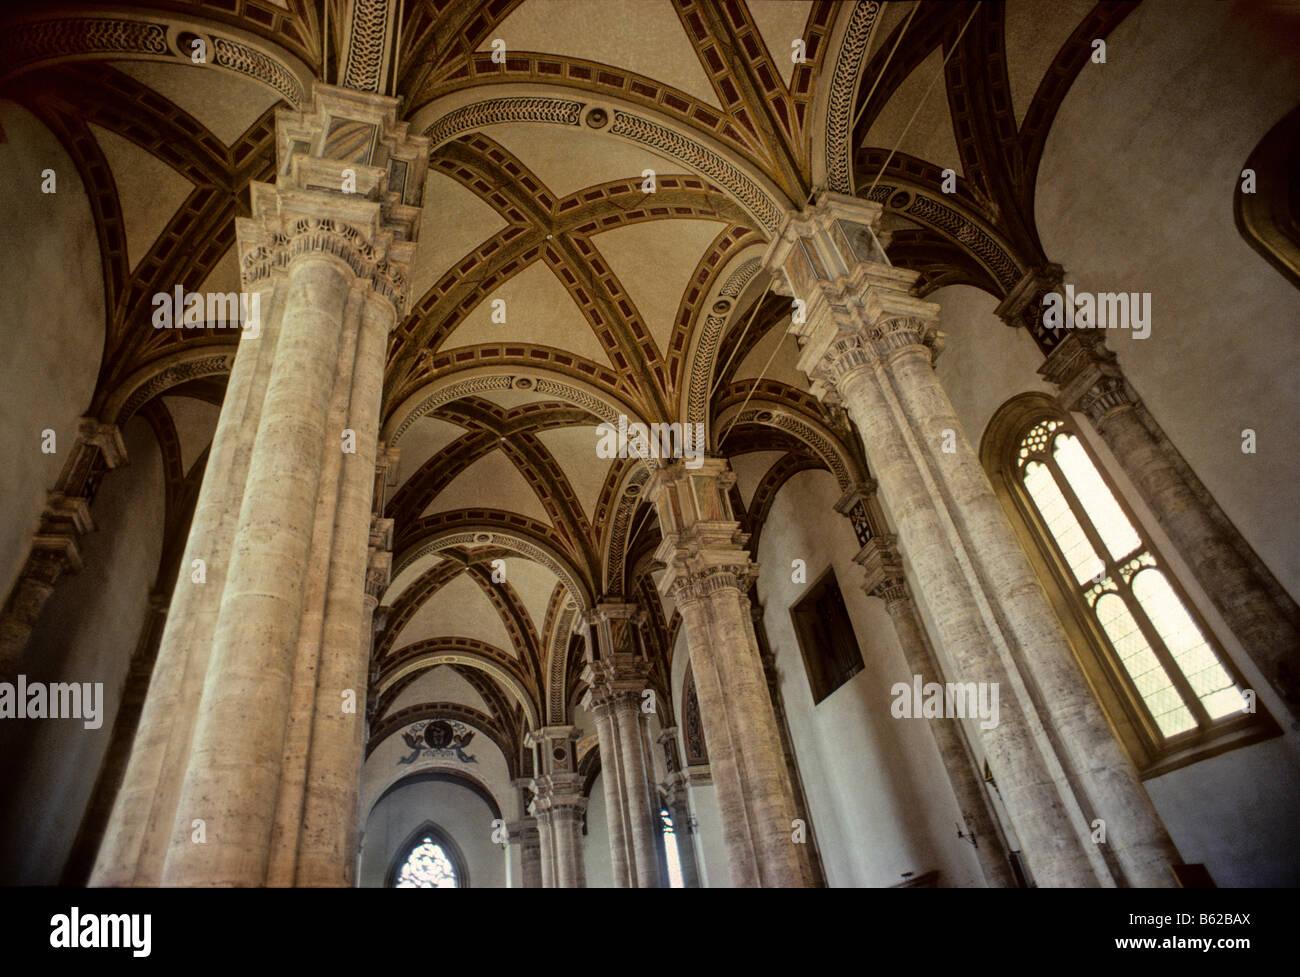 Cathedral of Santa Maria Assunta, cross-vault, hall church, Piazza Pio II, Pienza, province of Siena, Tuscany, Italy, - Stock Image